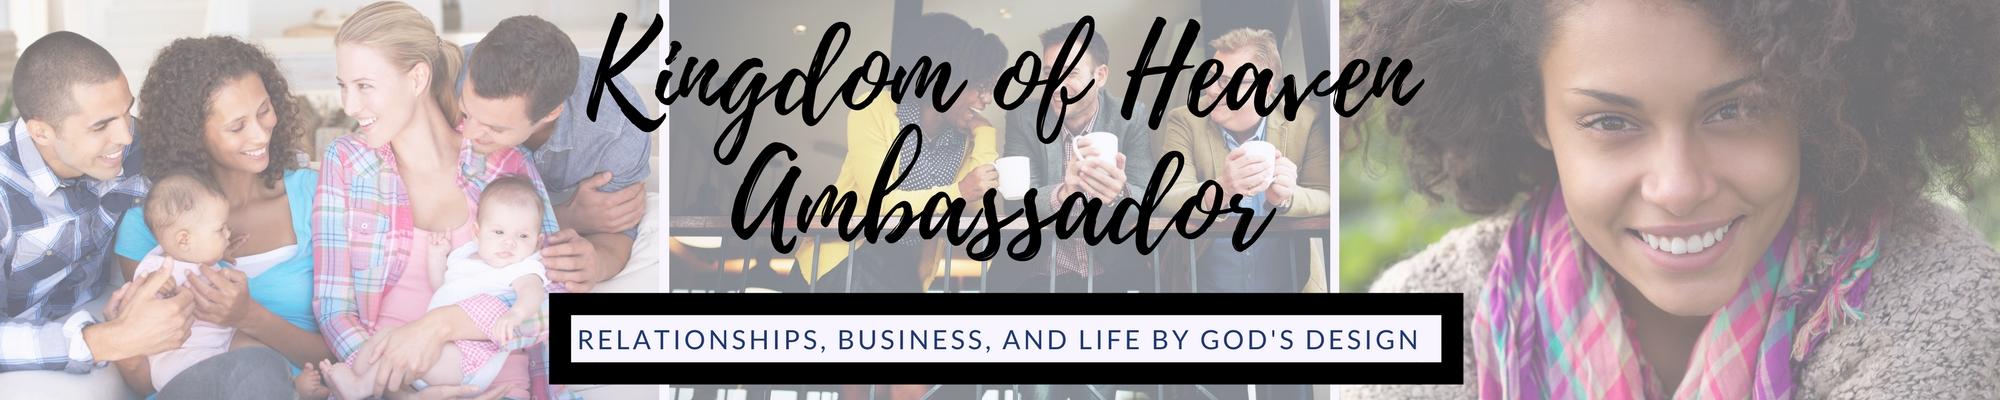 Kingdom of Heaven Ambassador